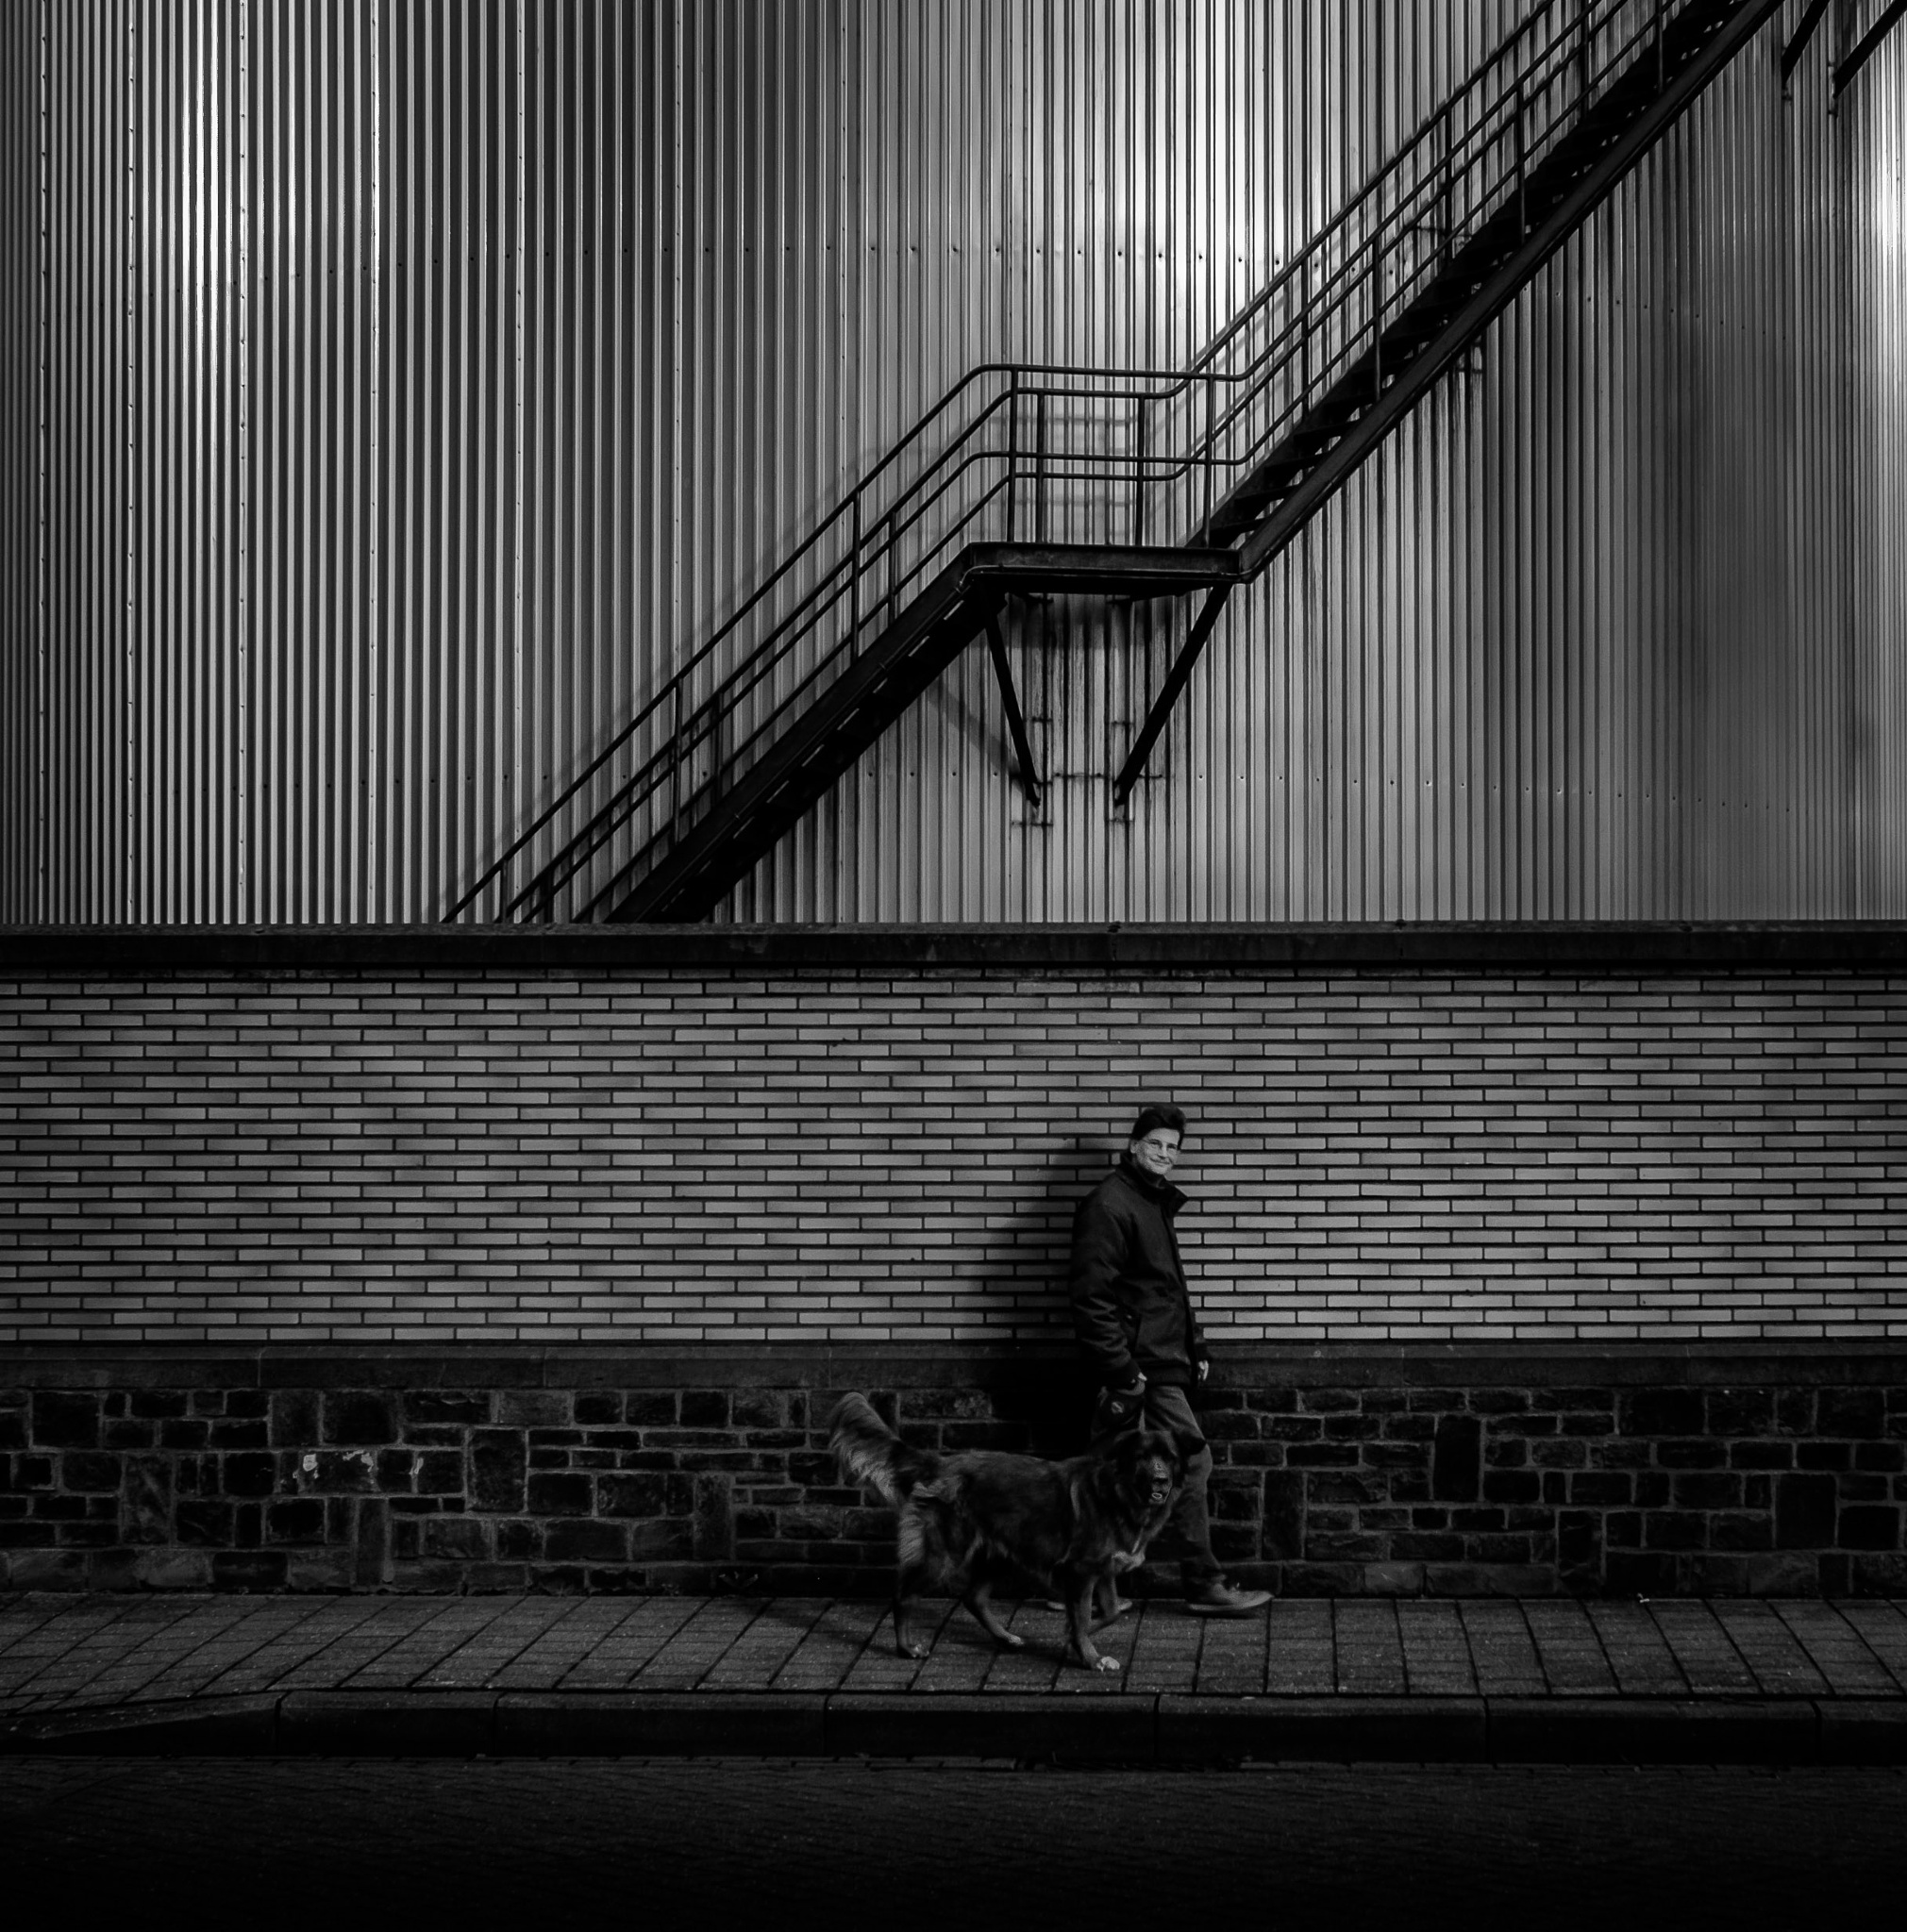 The dog's way home by fotoclaesjohn